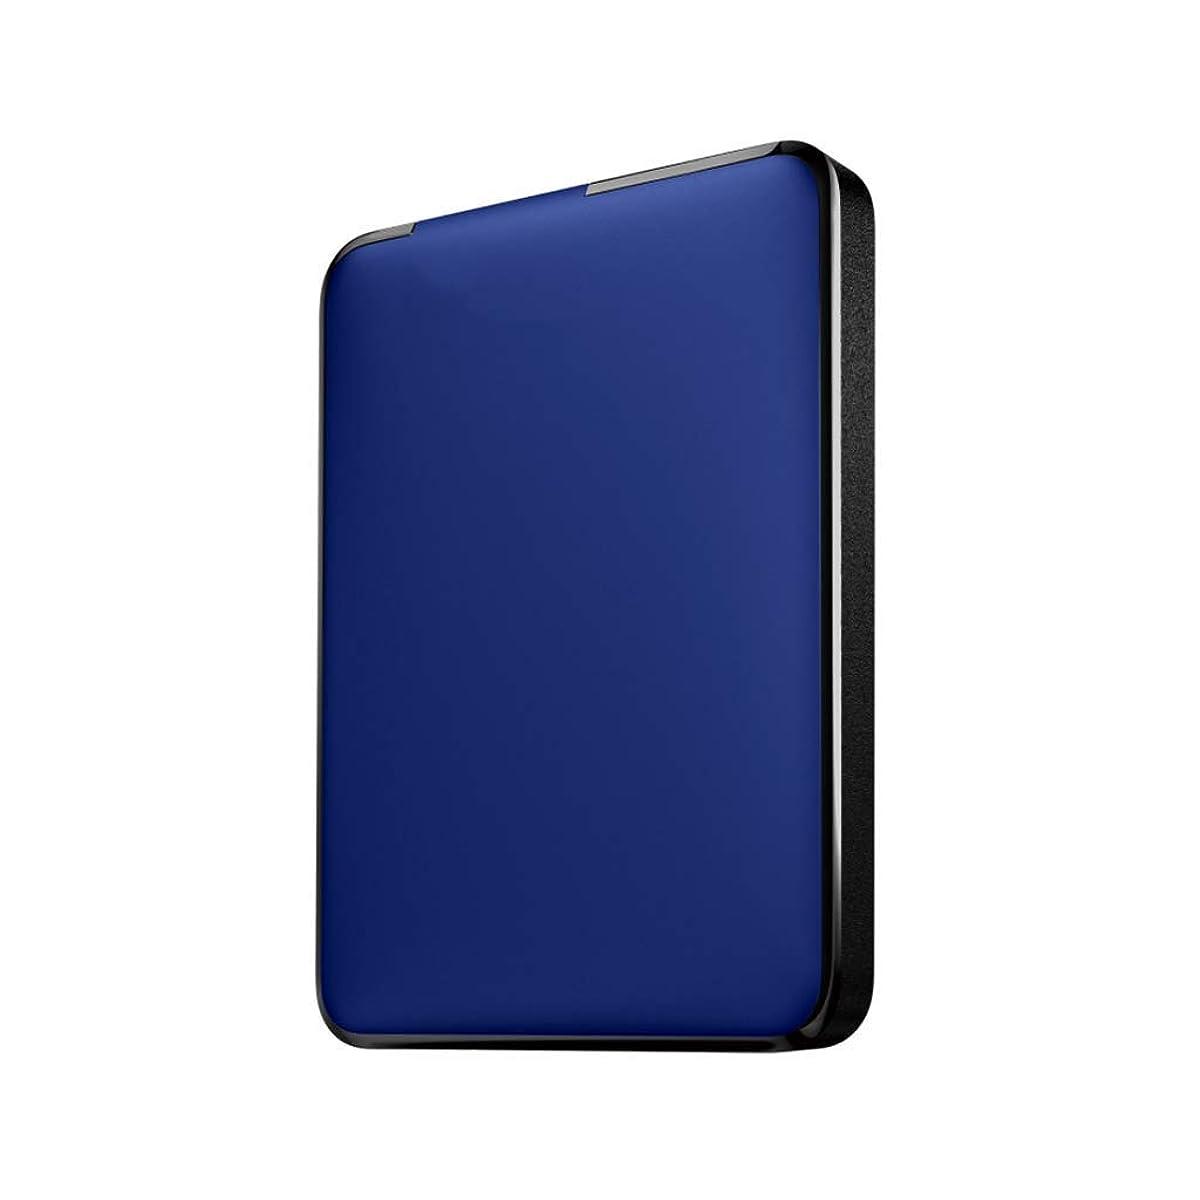 Mobile Hard Disk 80G/160G/250G/320G/500G/1TB Large-Capacity Memory 2.5-inch USB3.0 Computer External Mobile Hard Disk Blue (Size : 80GB)